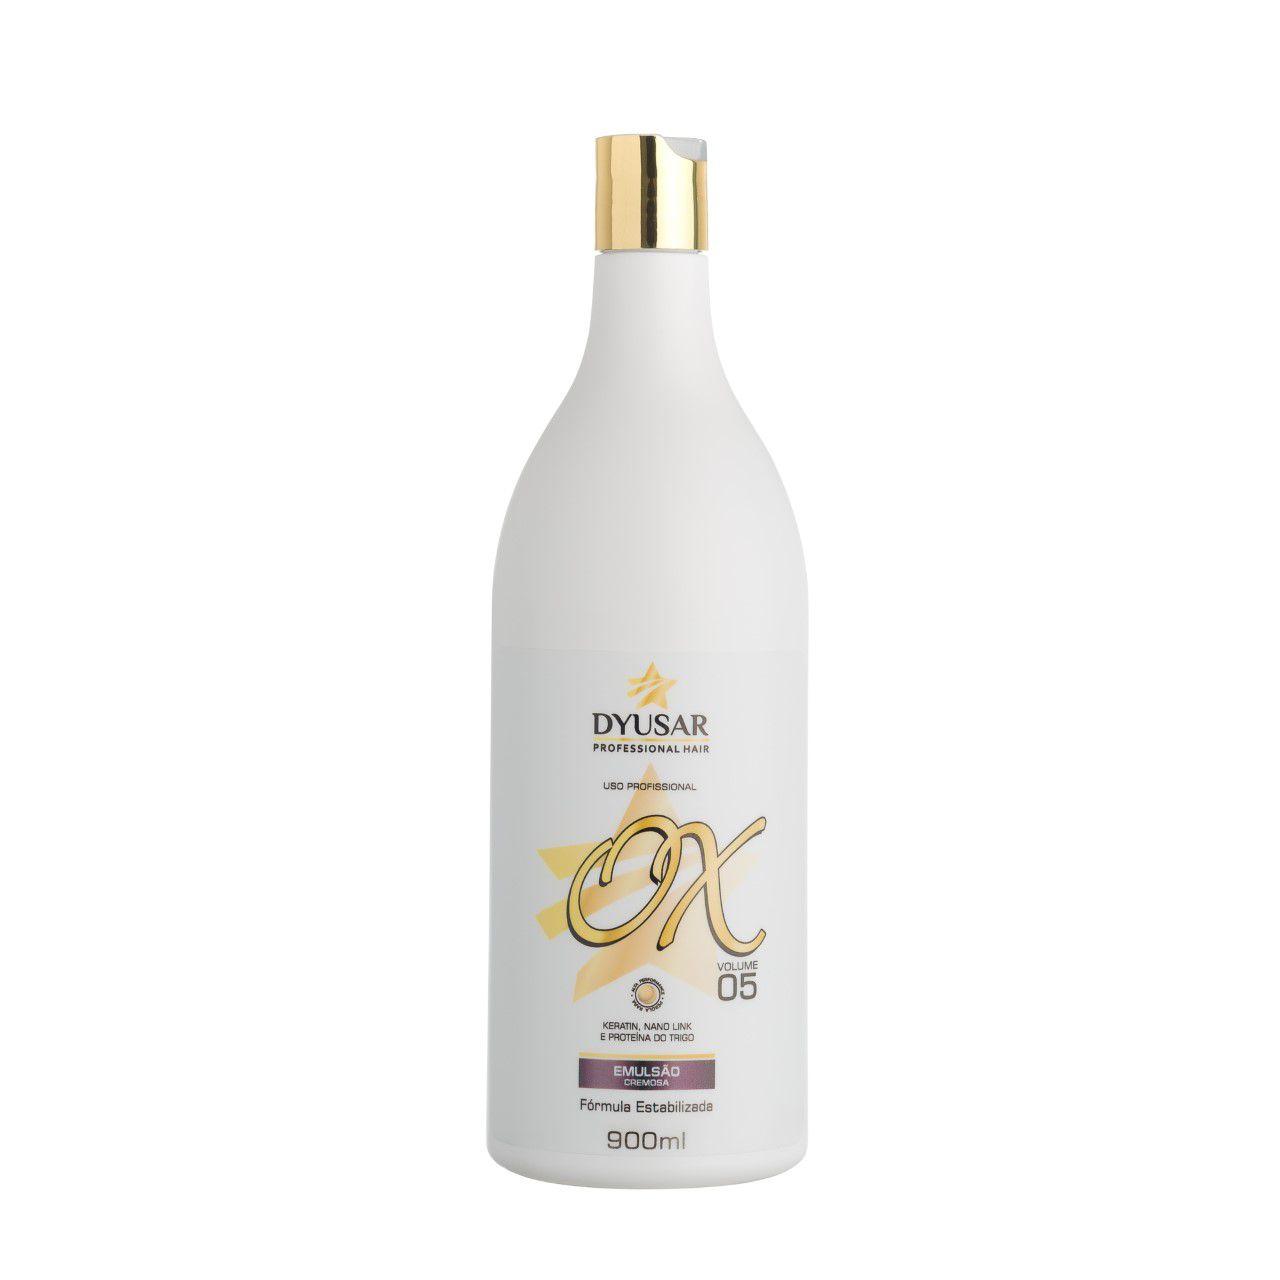 Oxidante Estabilizada - 5 Vol. DYUSAR Professional 900 ml